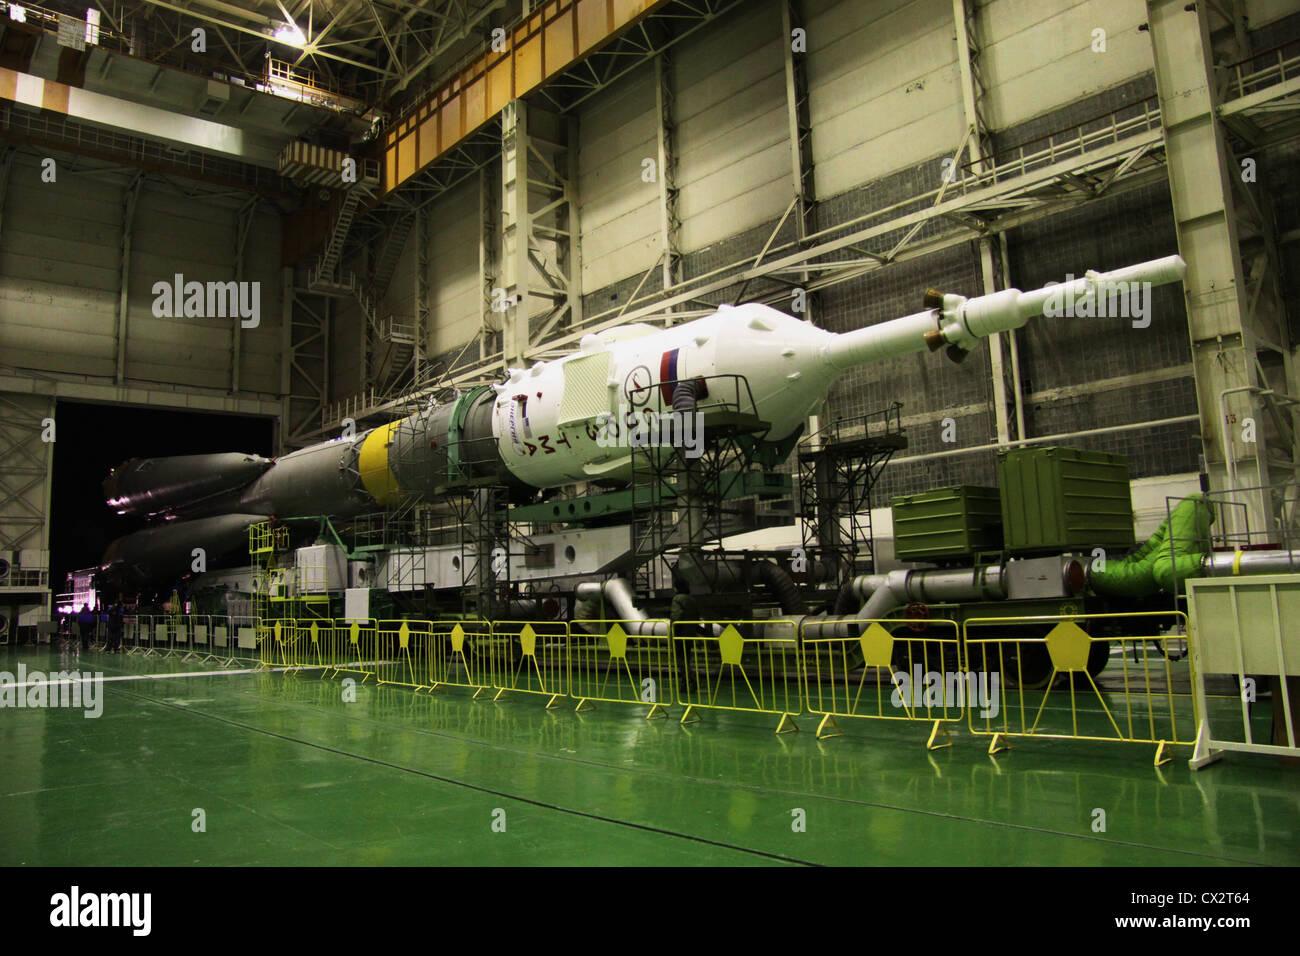 ITAR-TASS: BAIKONUR, KAZAKHSTAN. NOVEMBER 14. 2011. The Soyuz-FG rocket with the Soyuz TMA-22 capsule being transported - Stock Image